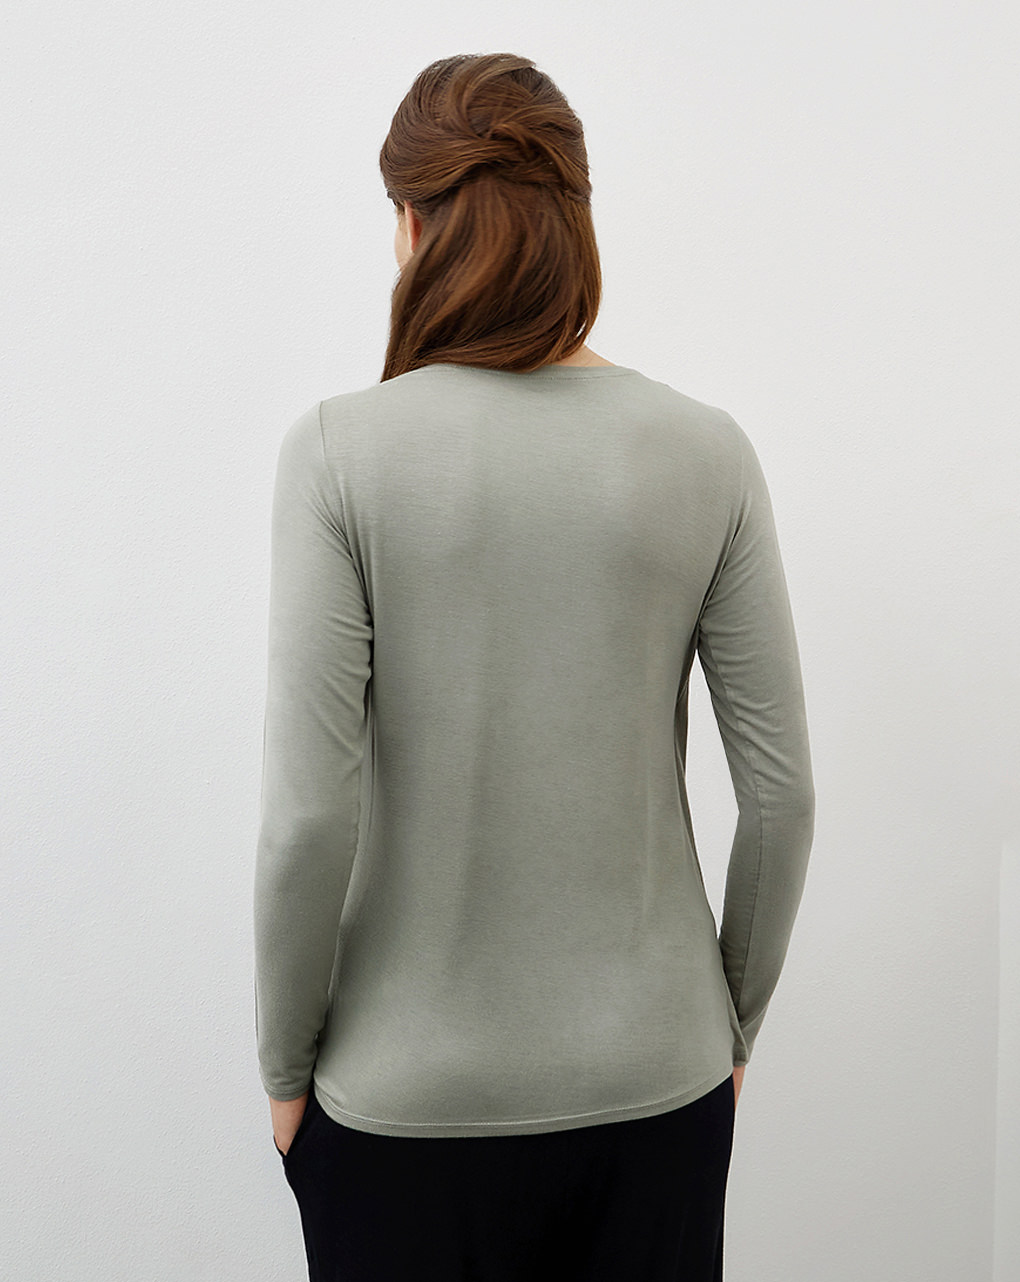 T-shirt premaman allattamento in viscosa stretch - Prénatal